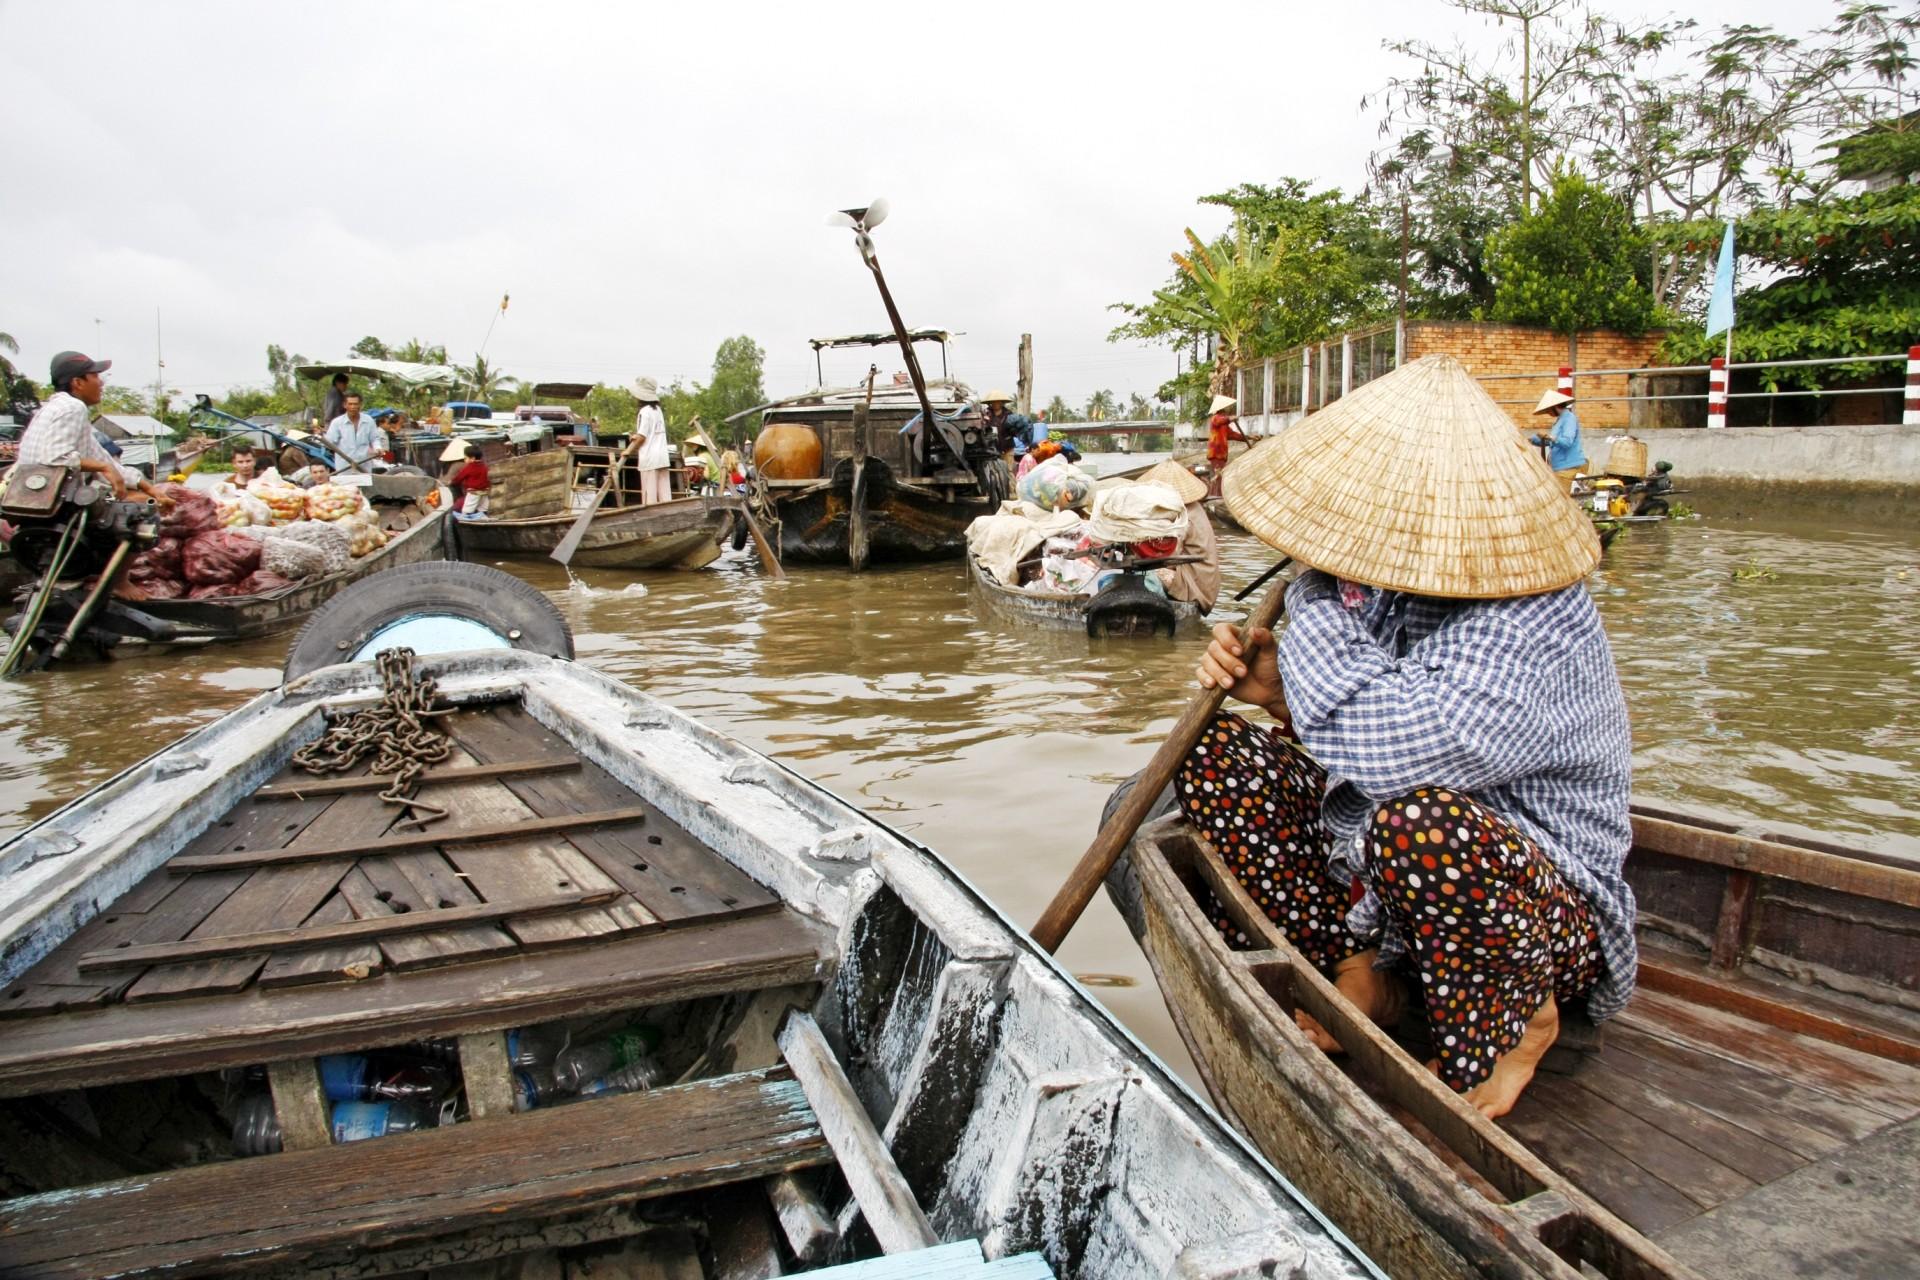 Family trip in Vietnam - Mekong Deta - cruising